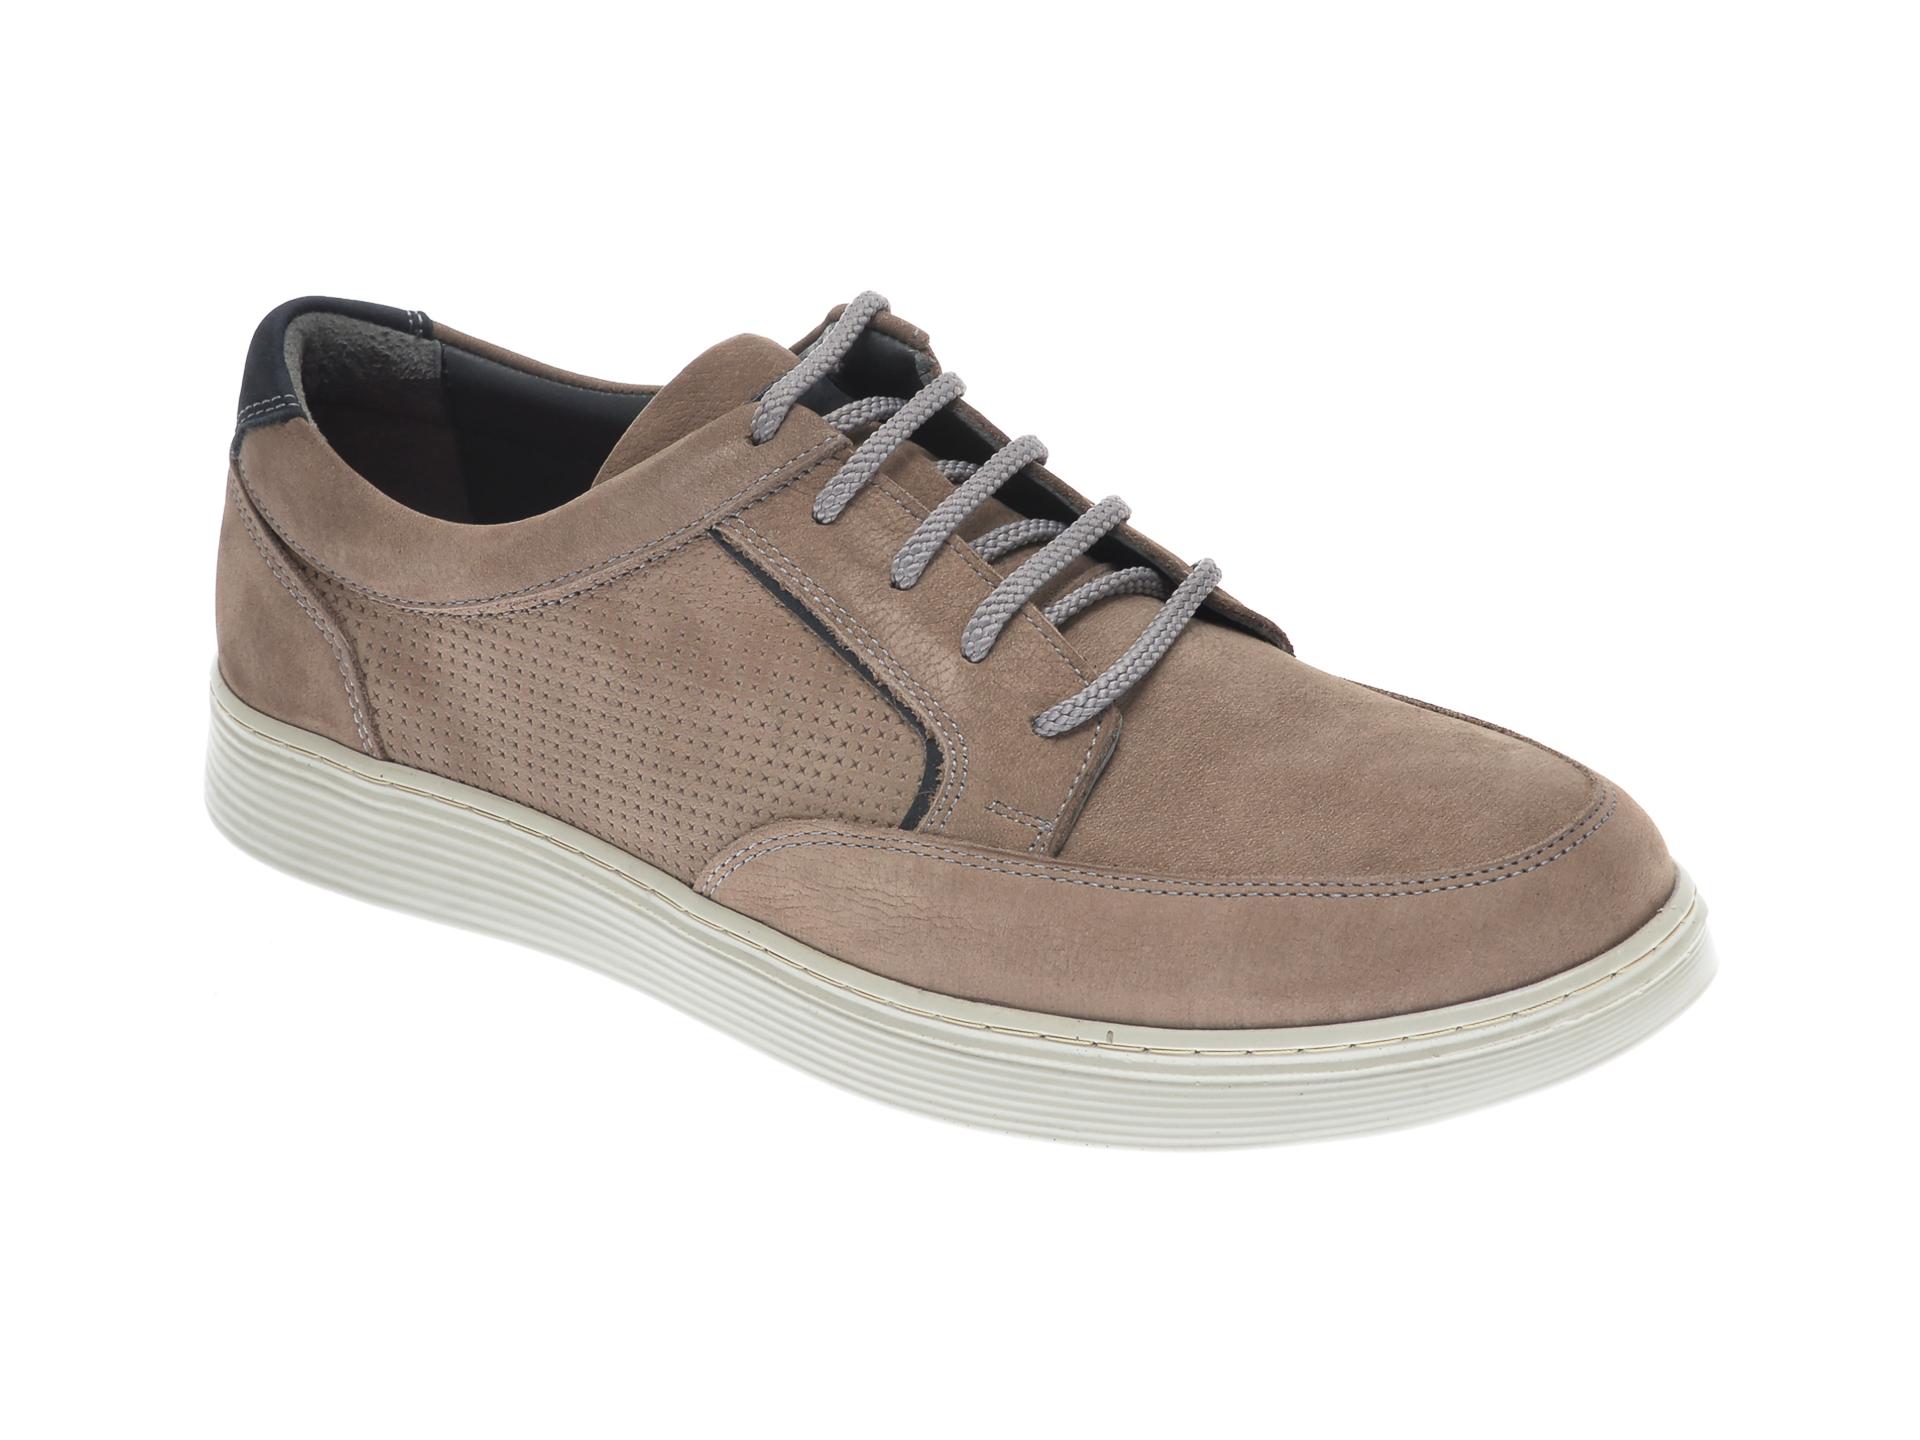 Pantofi OTTER gri, 204108, din nabuc New